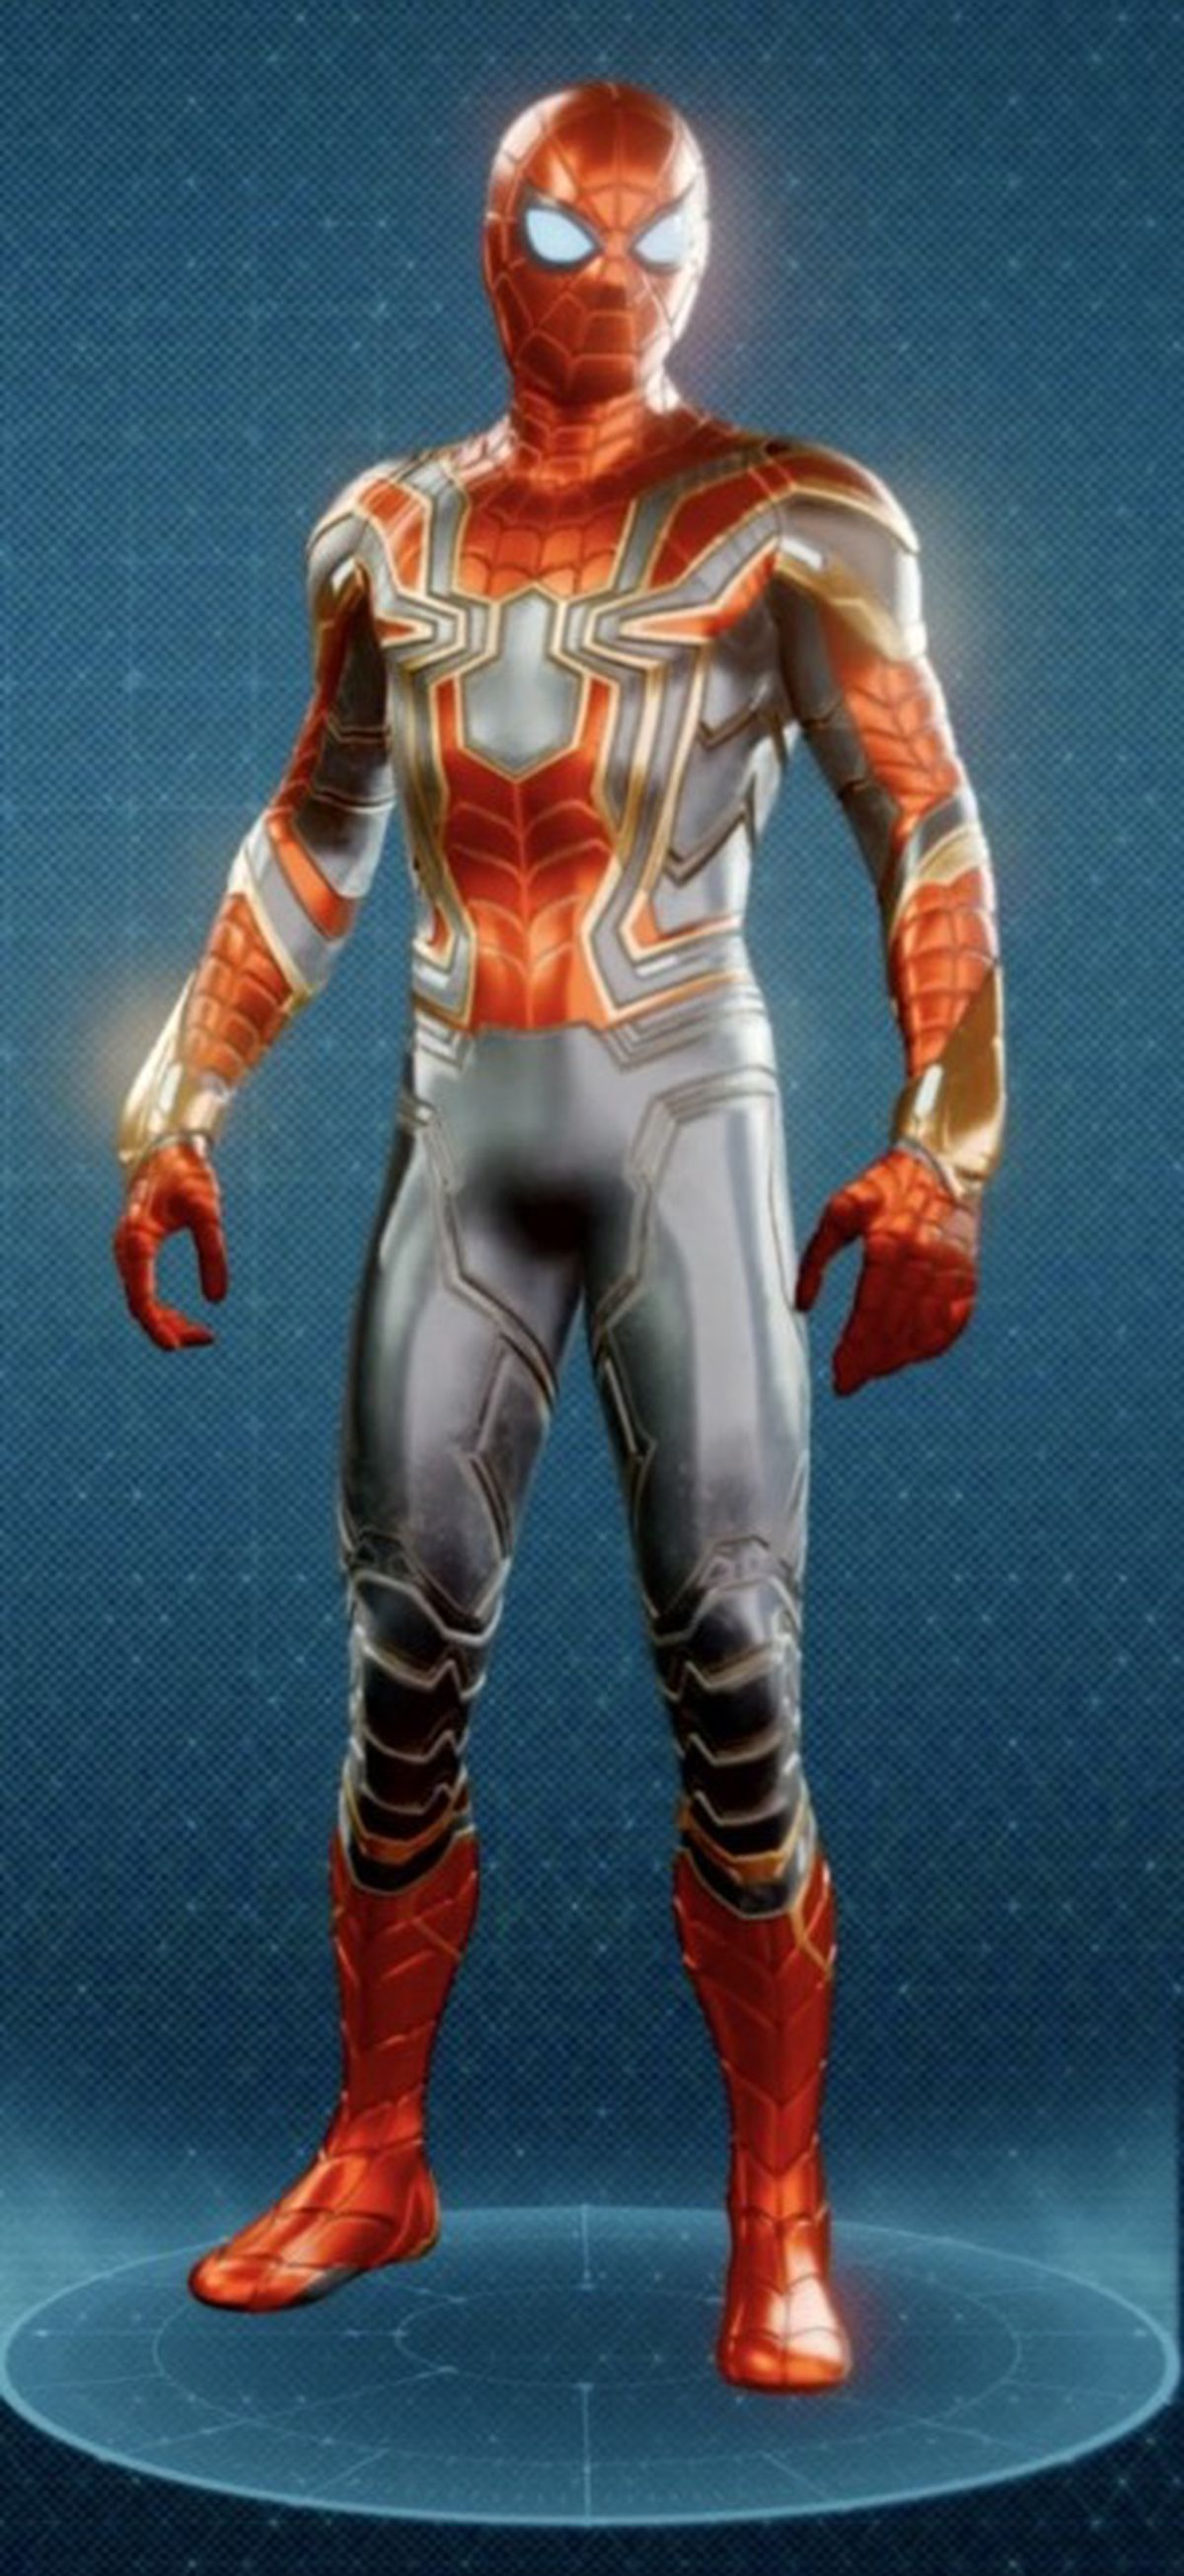 Spiderman Ps4 Trophäen